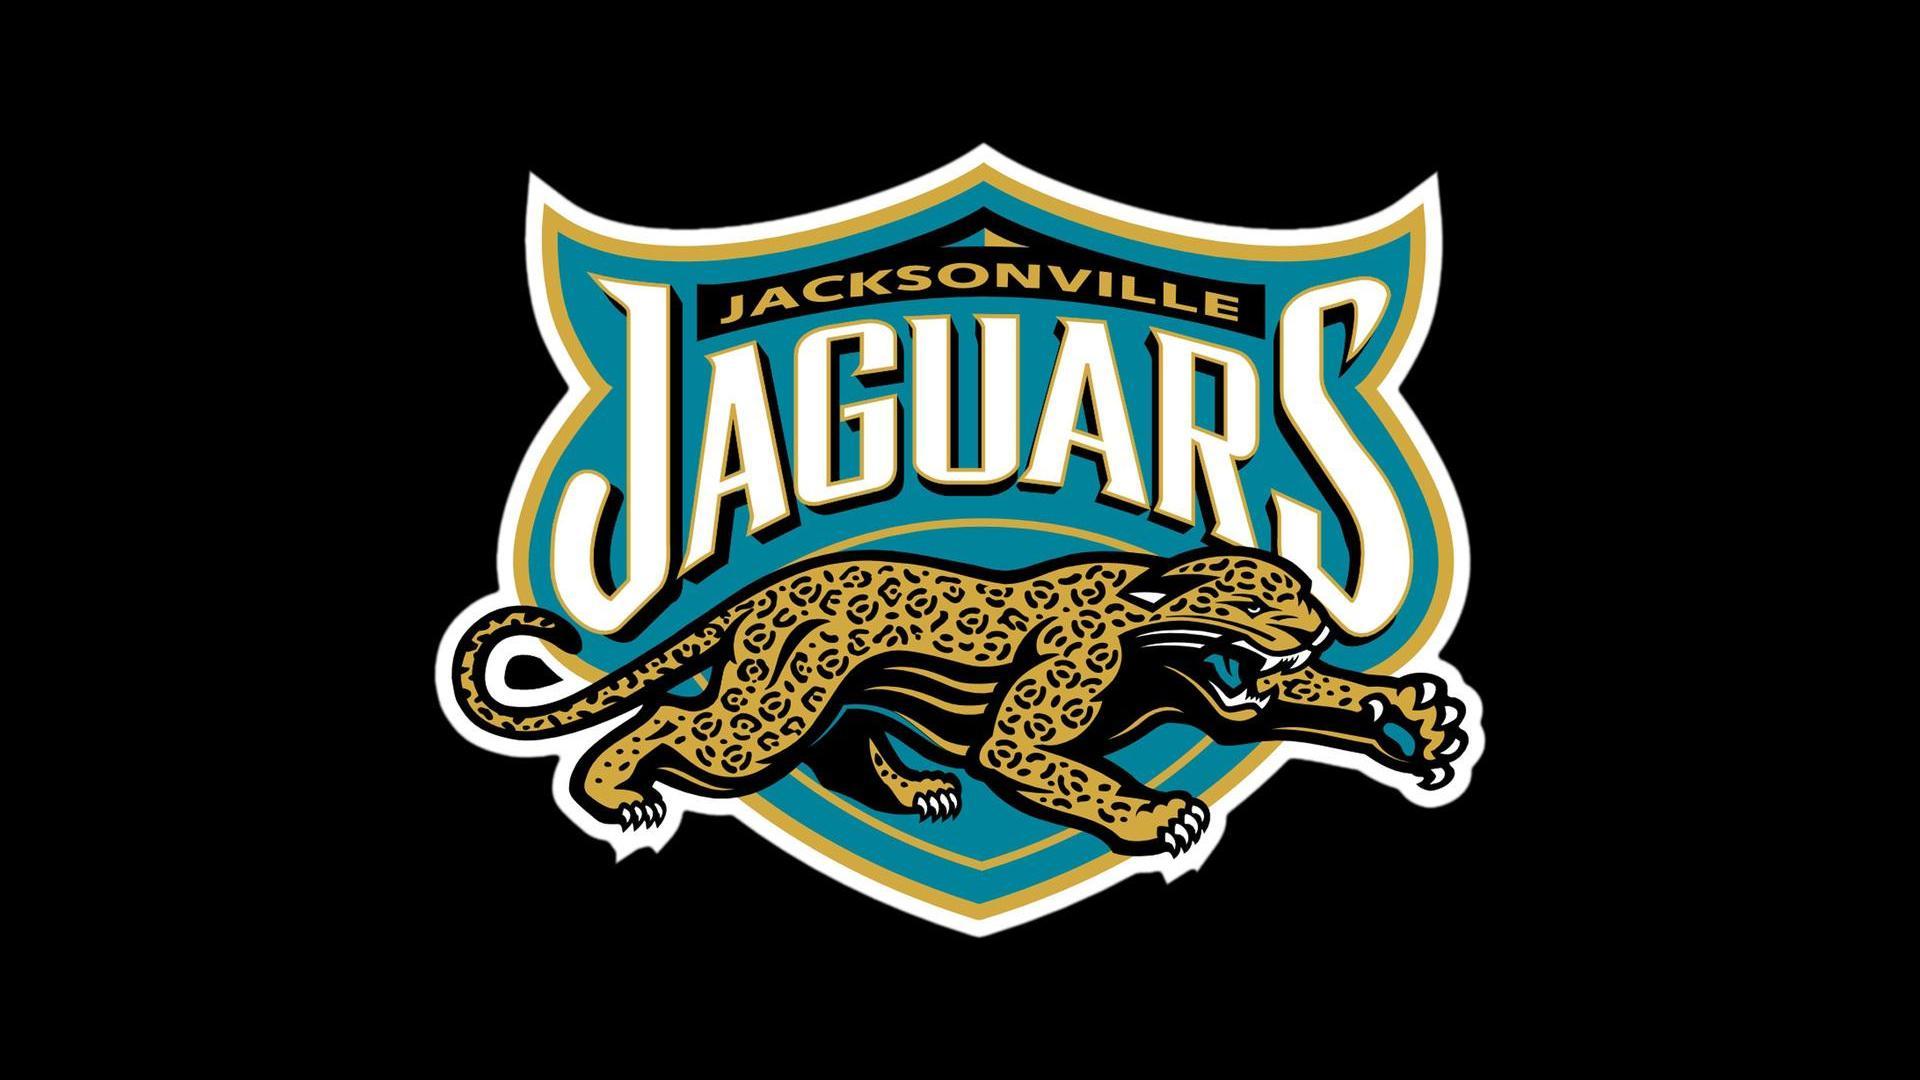 Jacksonville Jaguars Wallpaper Image Group 35 1920x1080